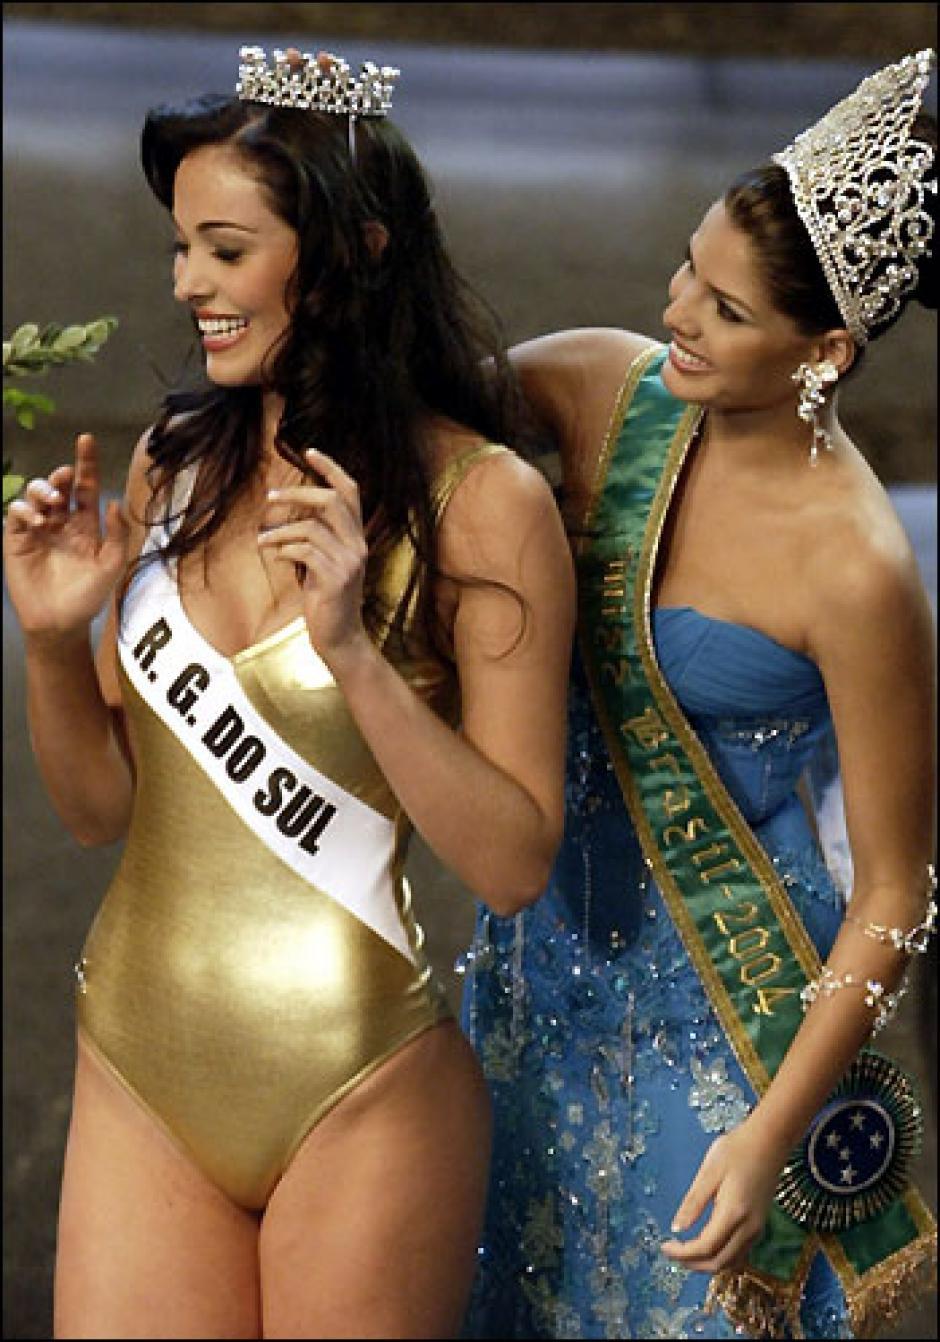 En 2004 Fabiane Niclotti fue coronada como Miss Brasil. (Foto: Folha)